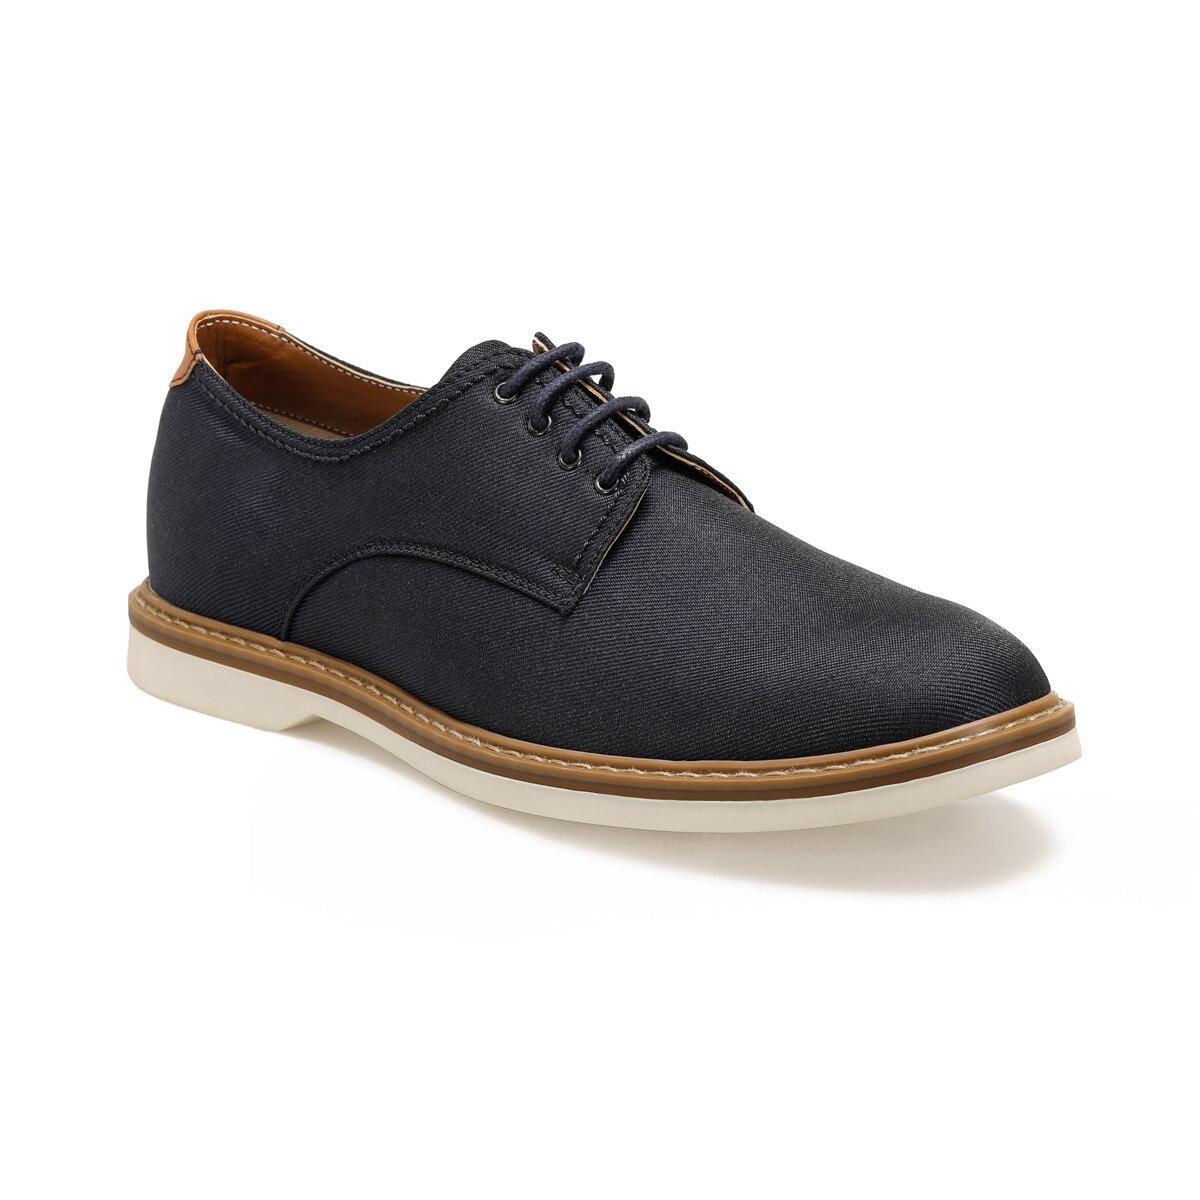 FLO 61120 Navy Blue Men 'S Dress Shoes JJ-Stiller